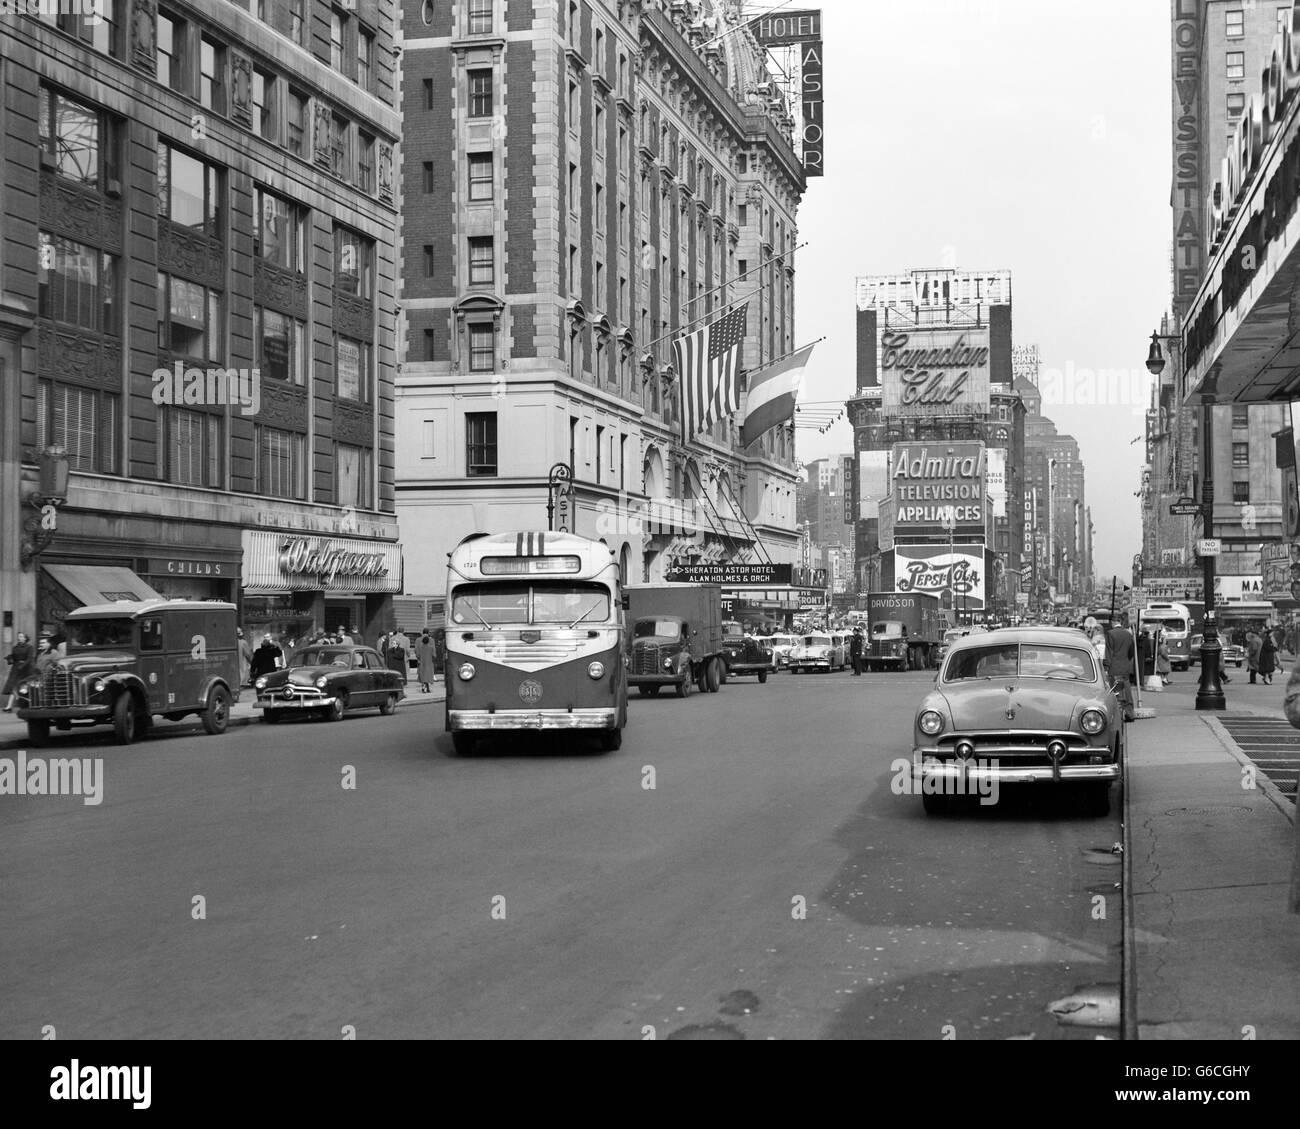 Baltimore Skyline Car Wallpaper 1950s New York City Times Square Traffic Broadway Bus